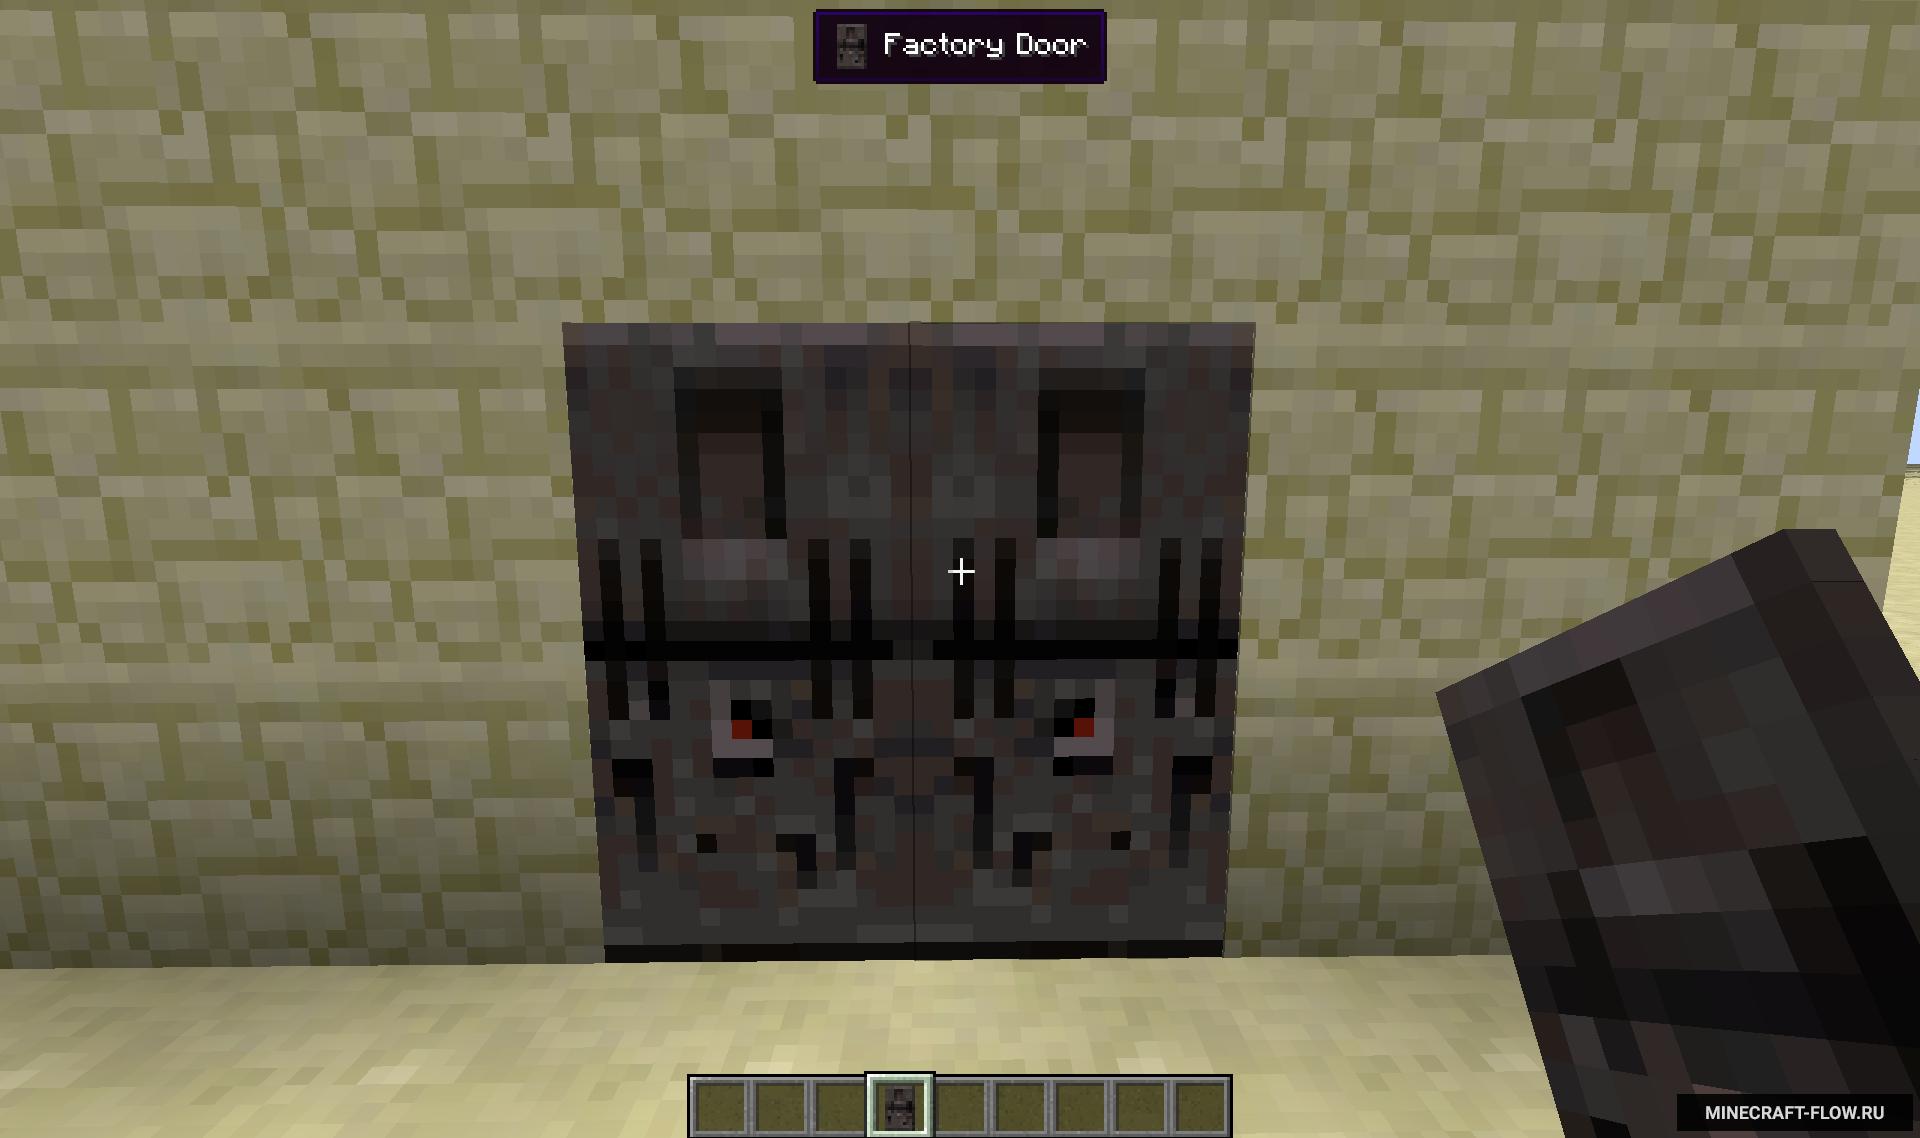 Мод на двери в Minecraft 1.12.2, 1.10.2, 1.11.2, 1.7.10 | MalisisDoors